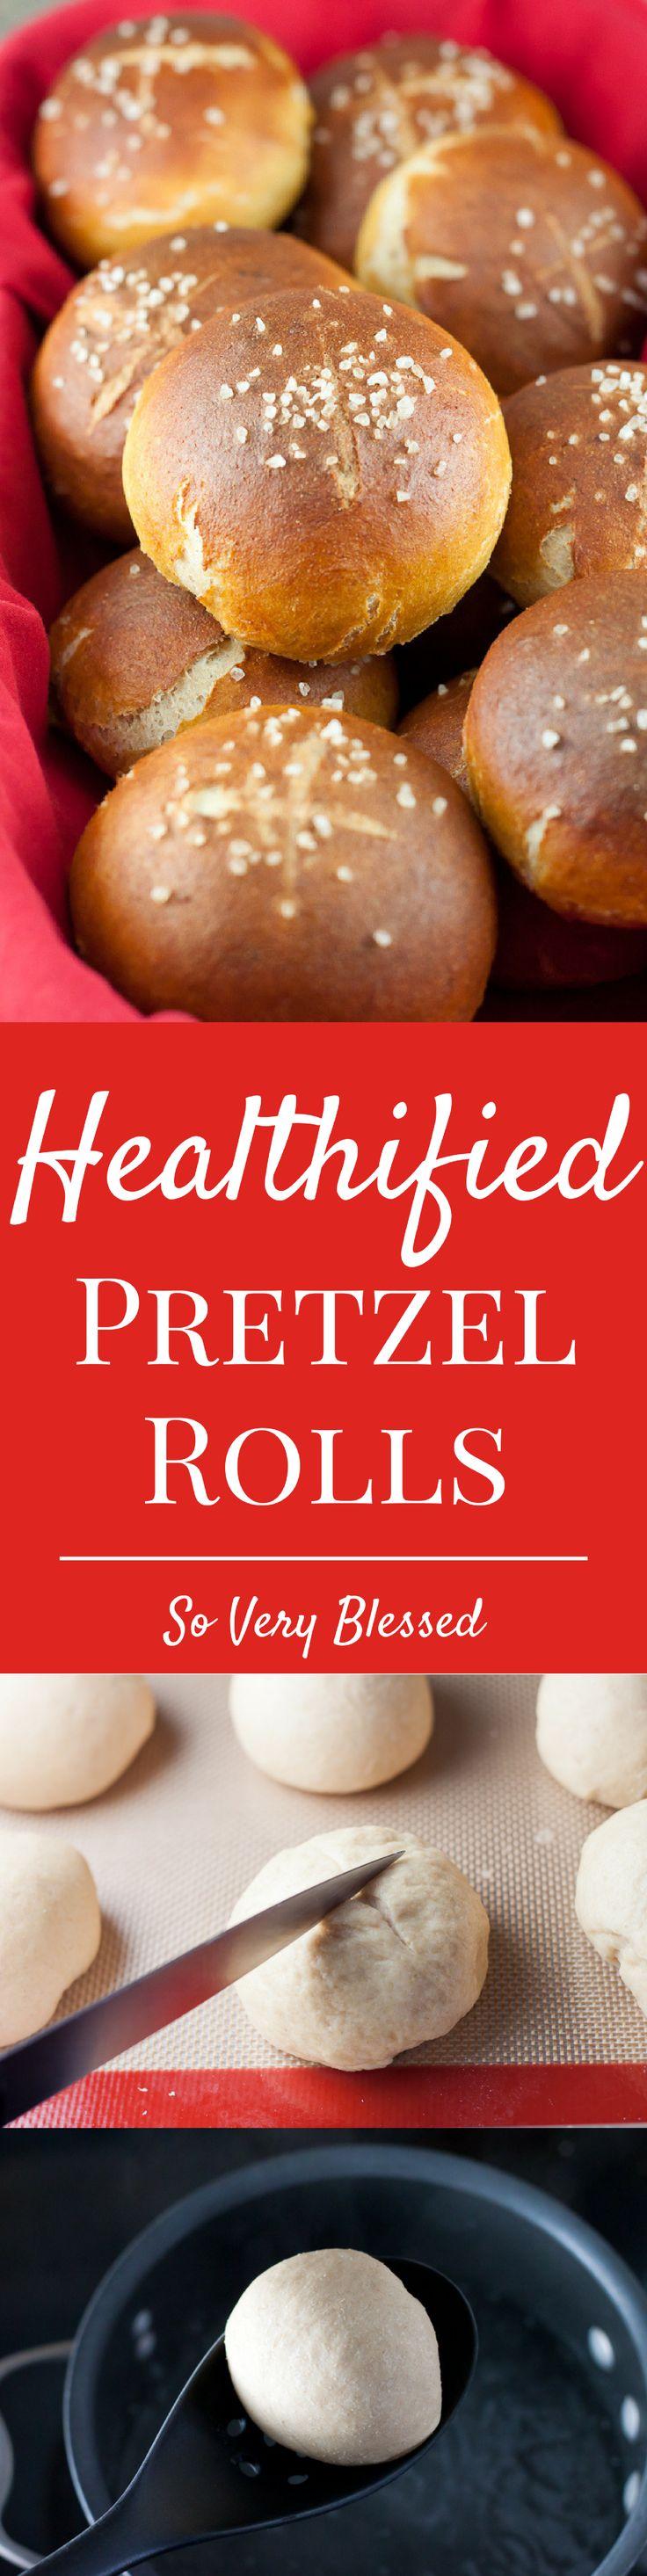 Healthier Pretzel Rolls Recipe - So Very Blessed